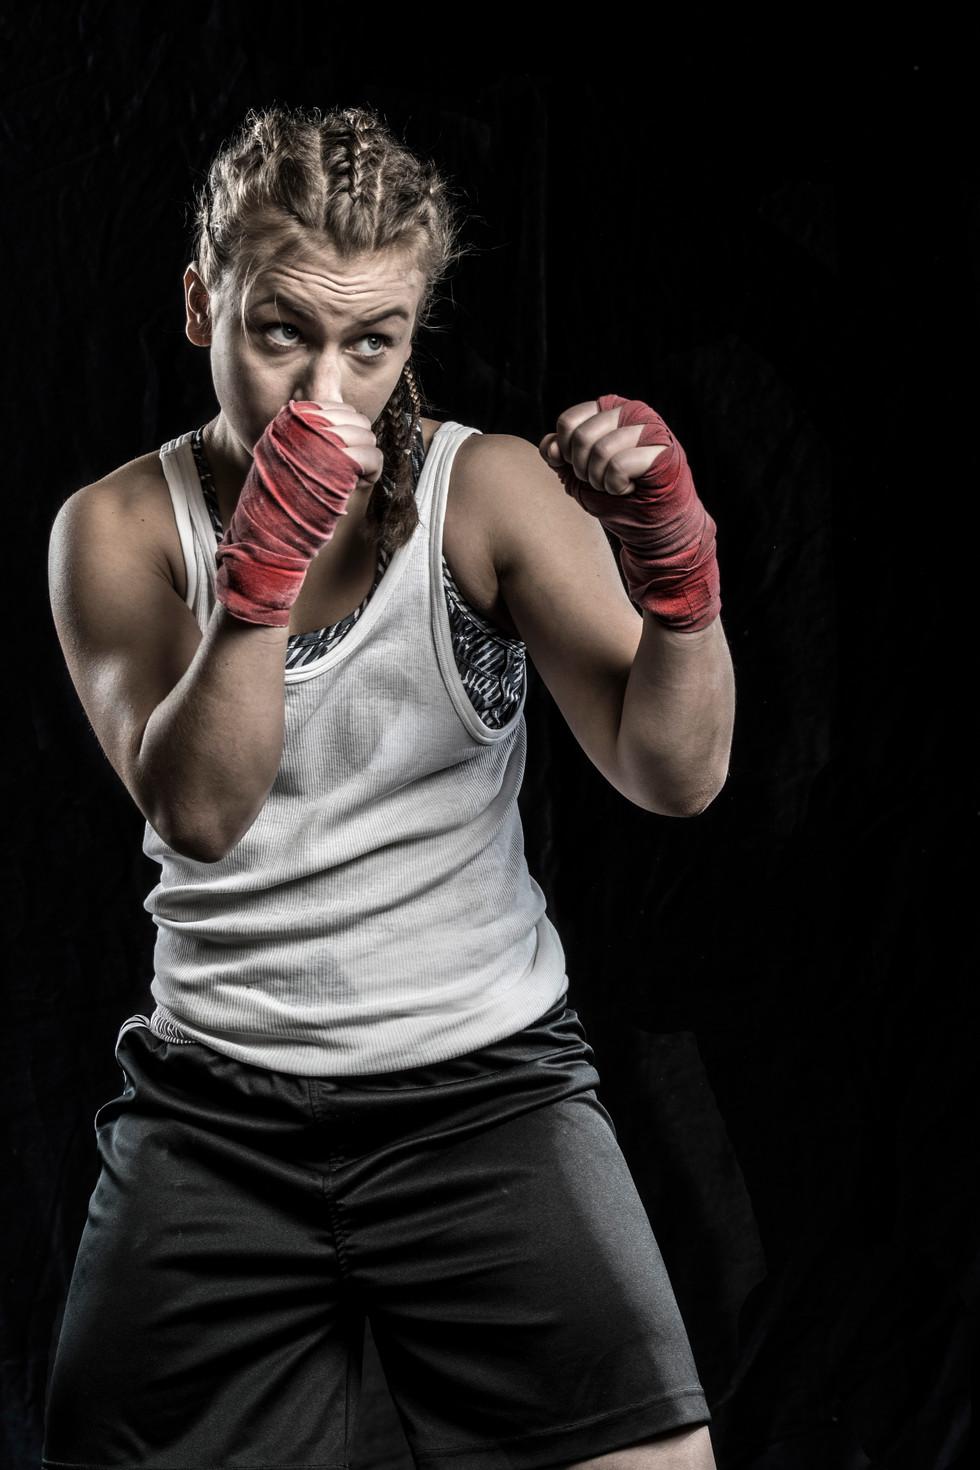 Sportfotografie-Boxen-Boxerin-19.jpg